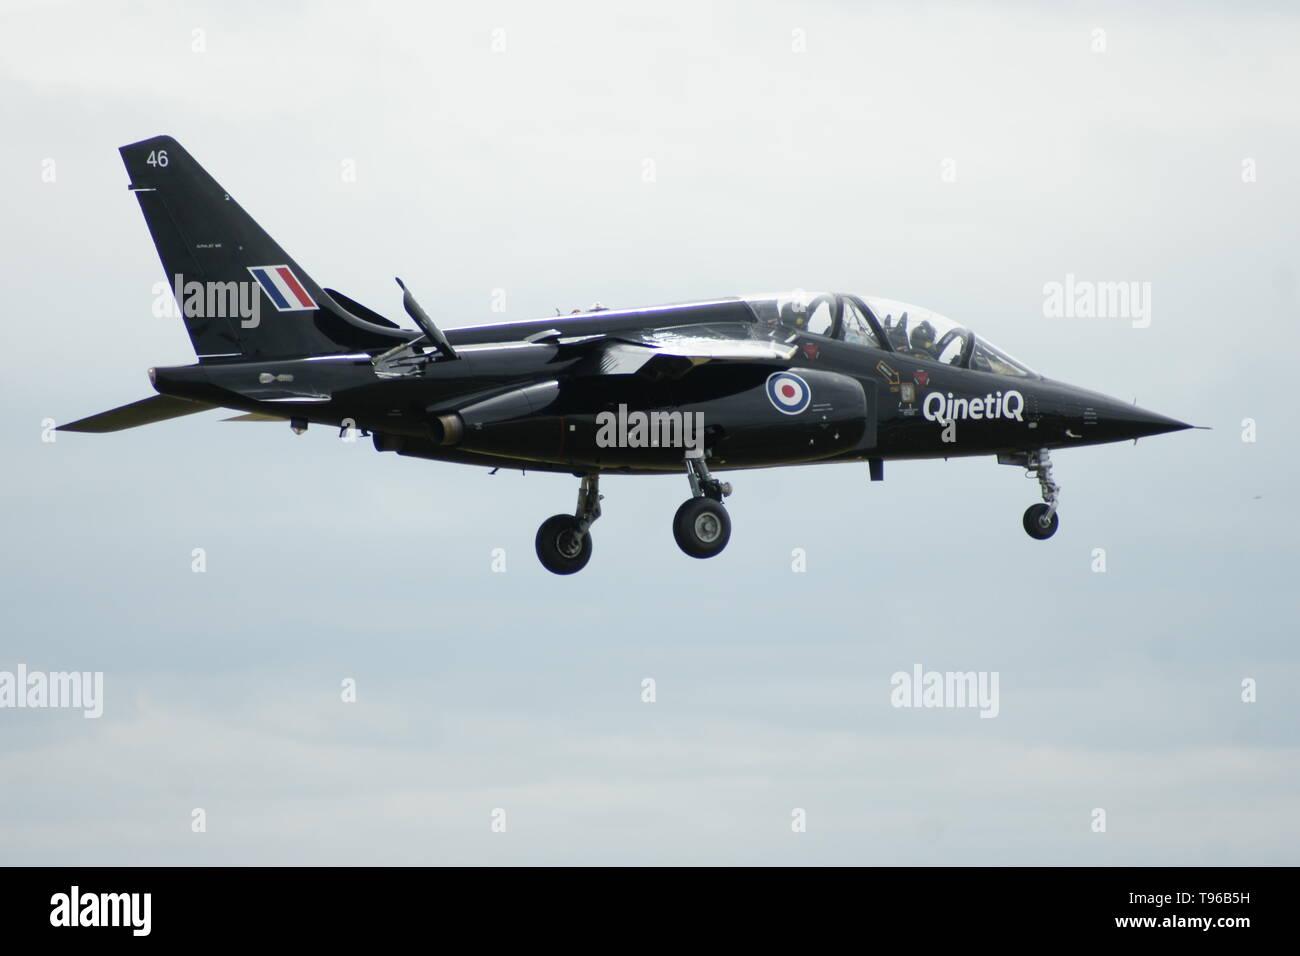 QinetiQ Alpha jet, Boscombe Down airfield - Stock Image